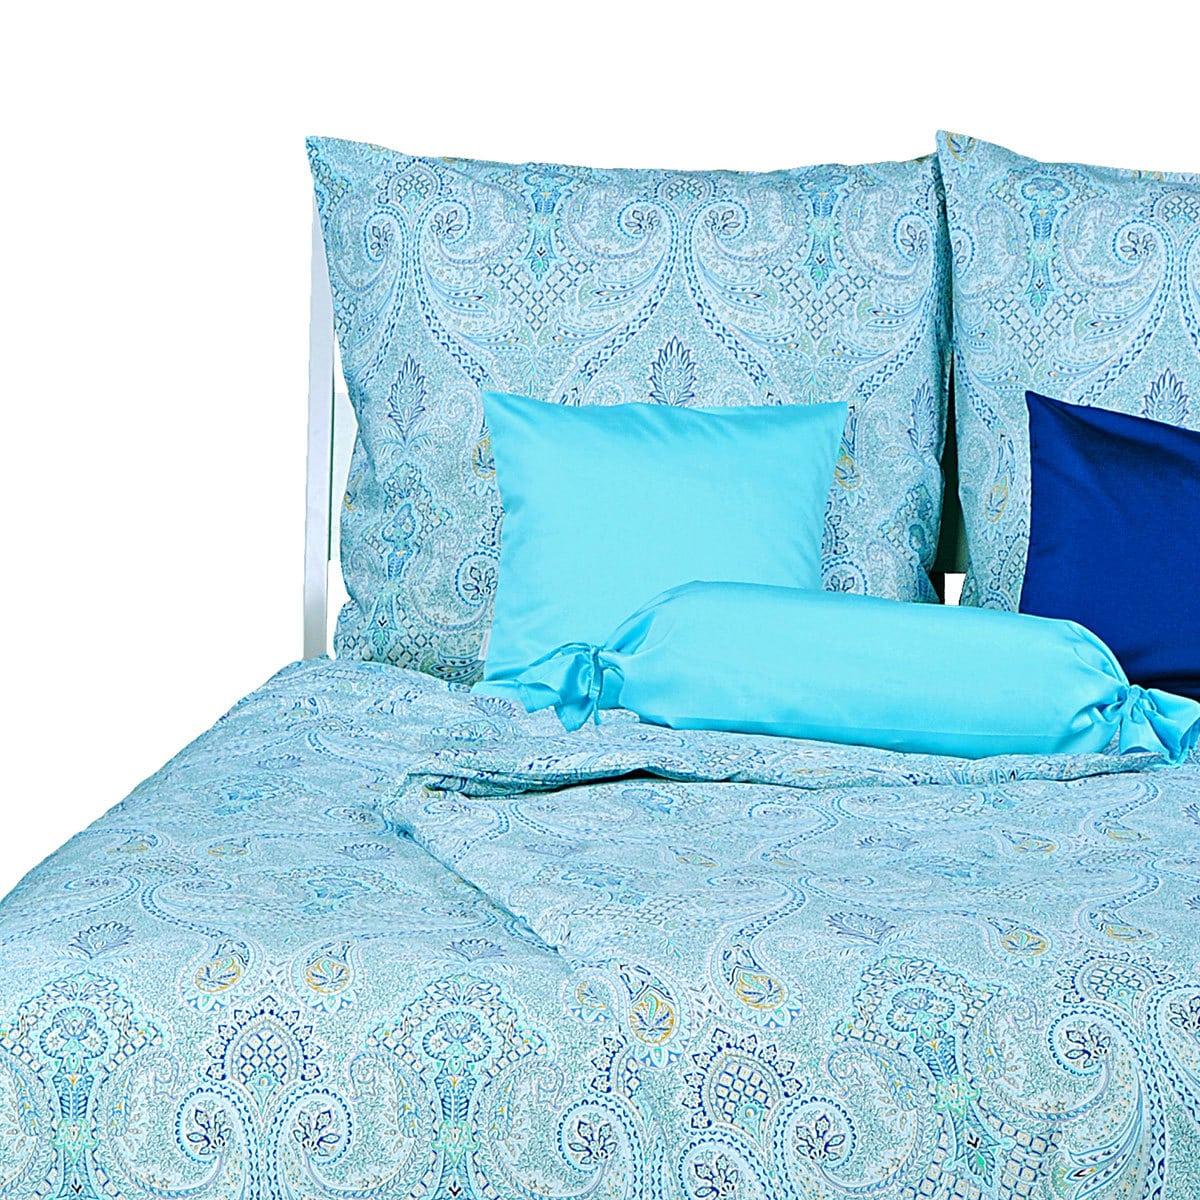 momm perkal bettw sche adora t rkis g nstig online kaufen bei bettwaren shop. Black Bedroom Furniture Sets. Home Design Ideas